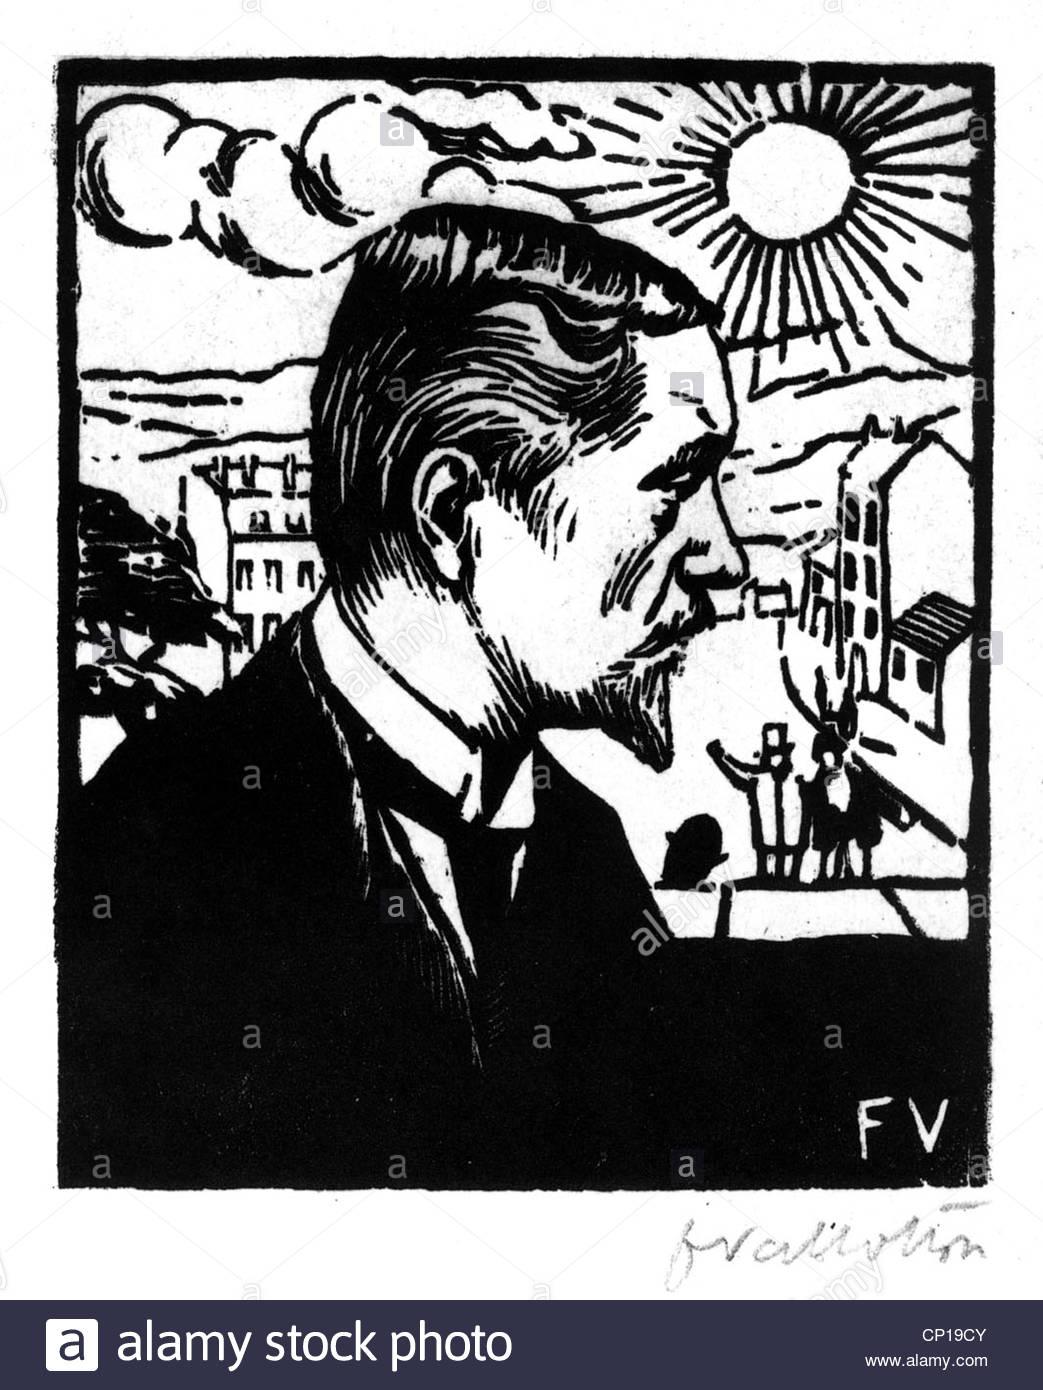 Künstler Braunschweig bildende kunst vallotton felix 1865 1925 selbstporträt 1891